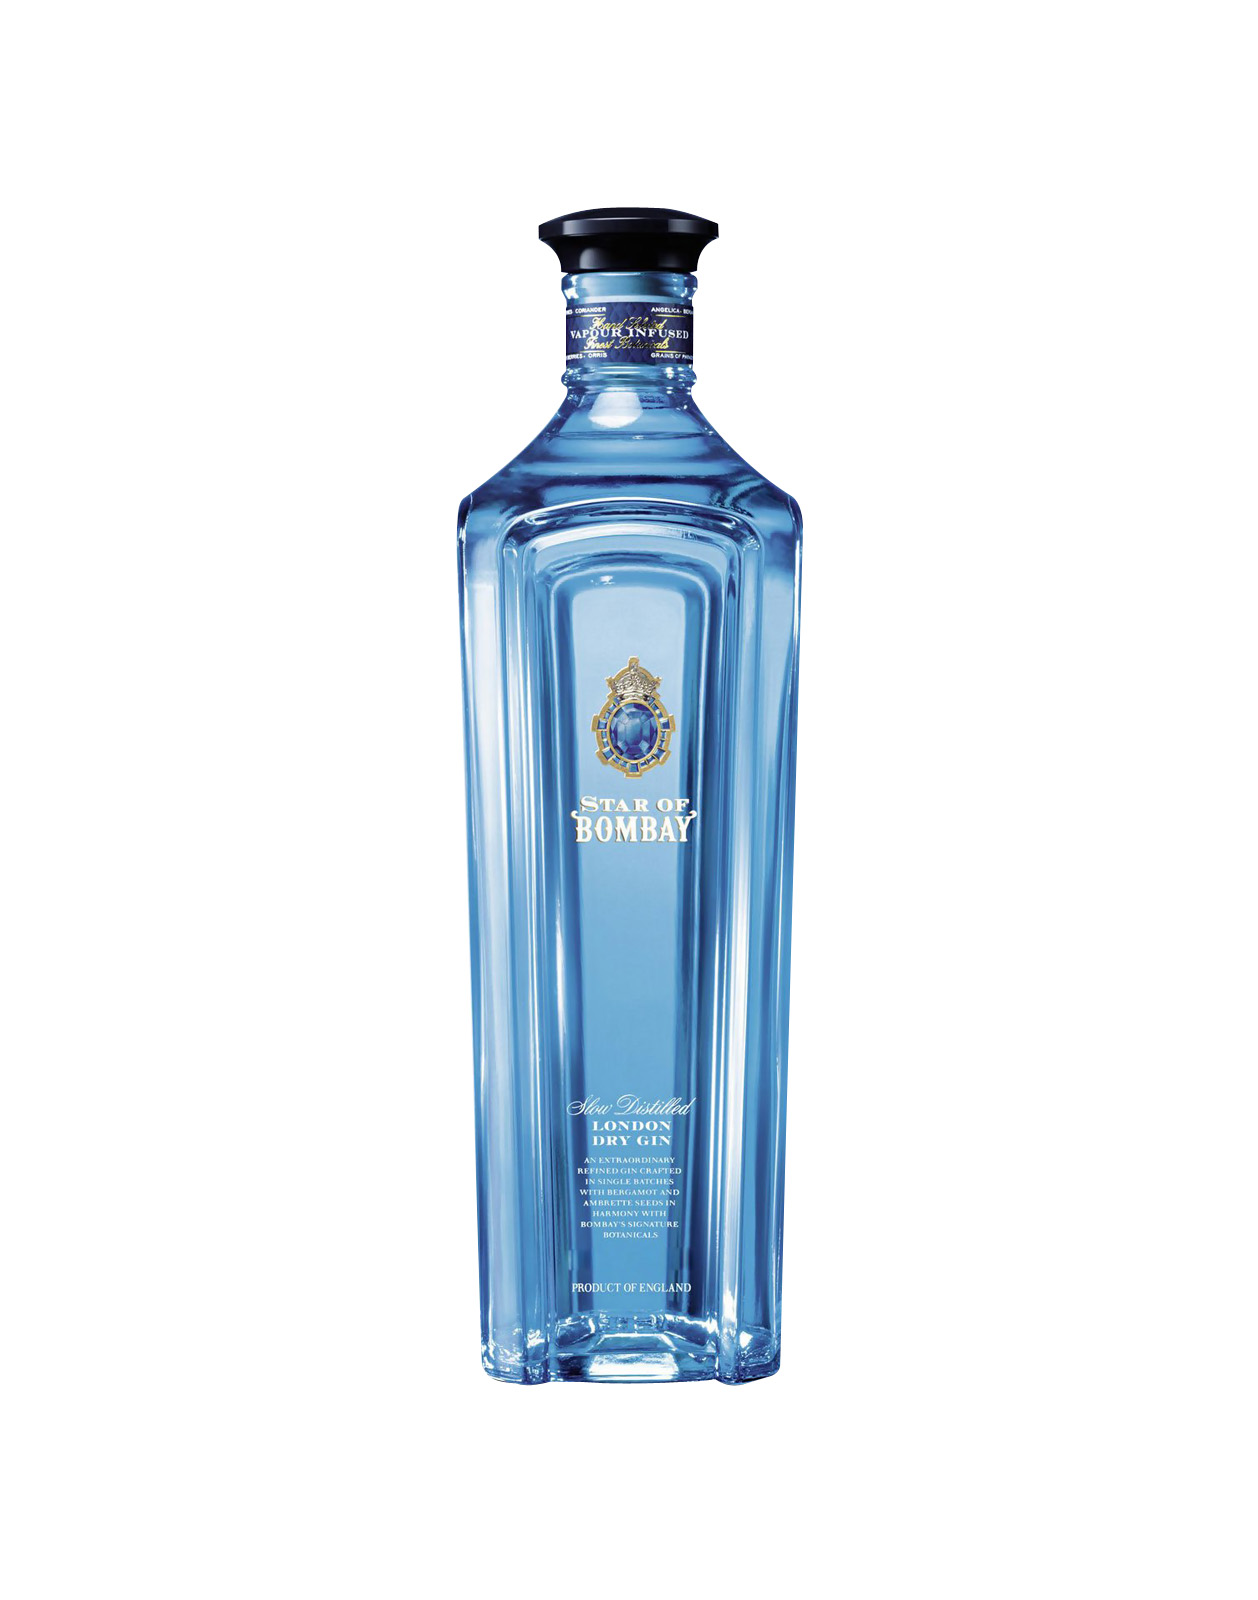 Star of Bombay 0,7L 48% gin, Bottleshop Sunny wines slnecnice mesto, petrzalka Bratislava, Gin, rozvoz alkoholu, eshop